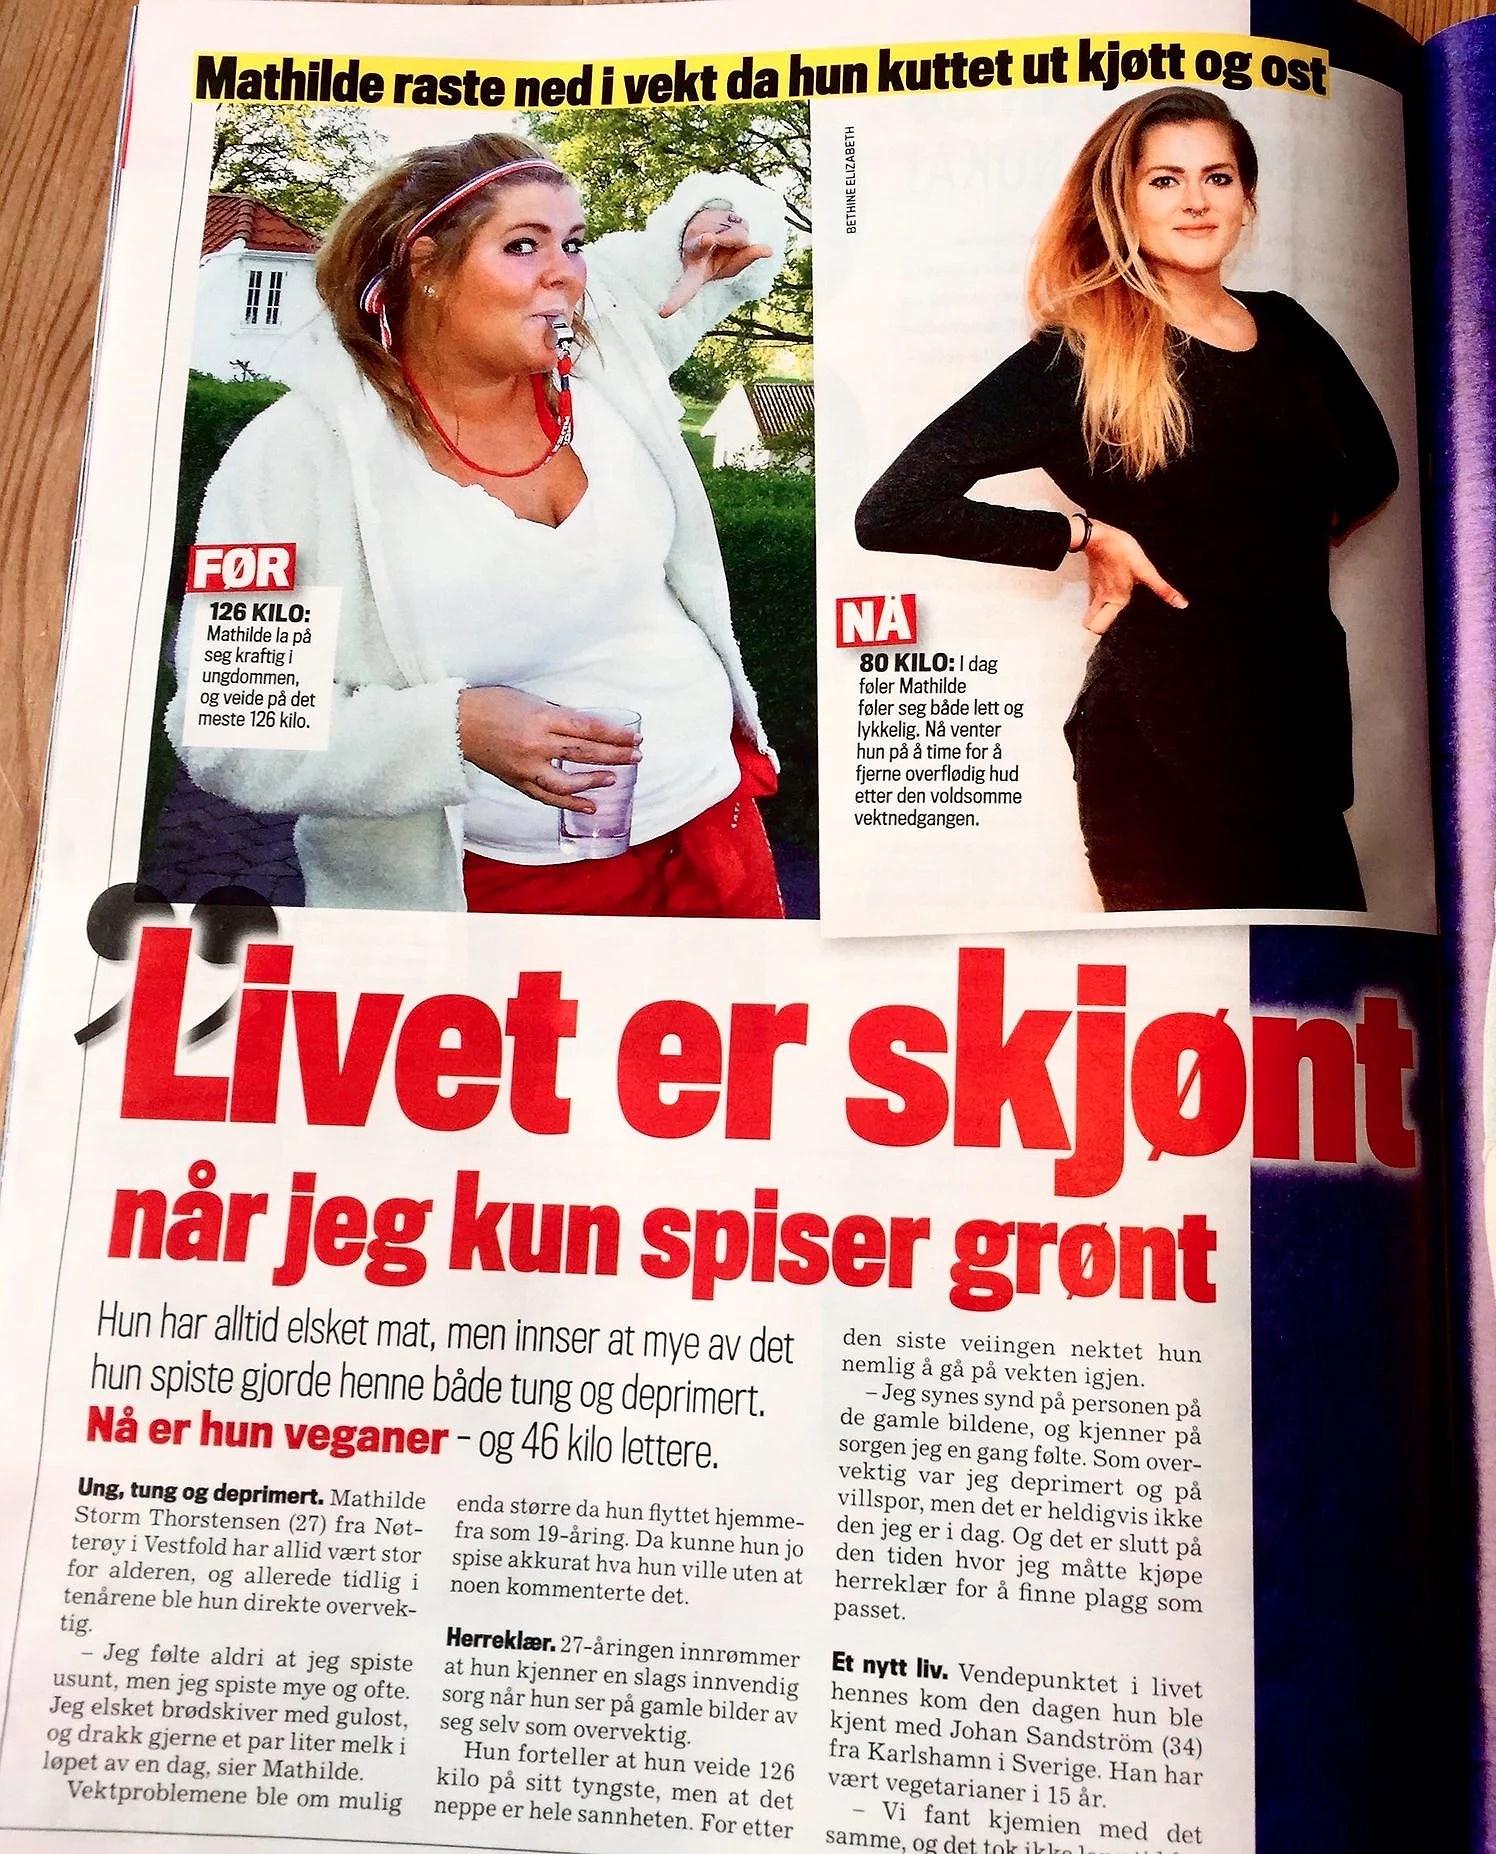 Intervju i Se&Hør